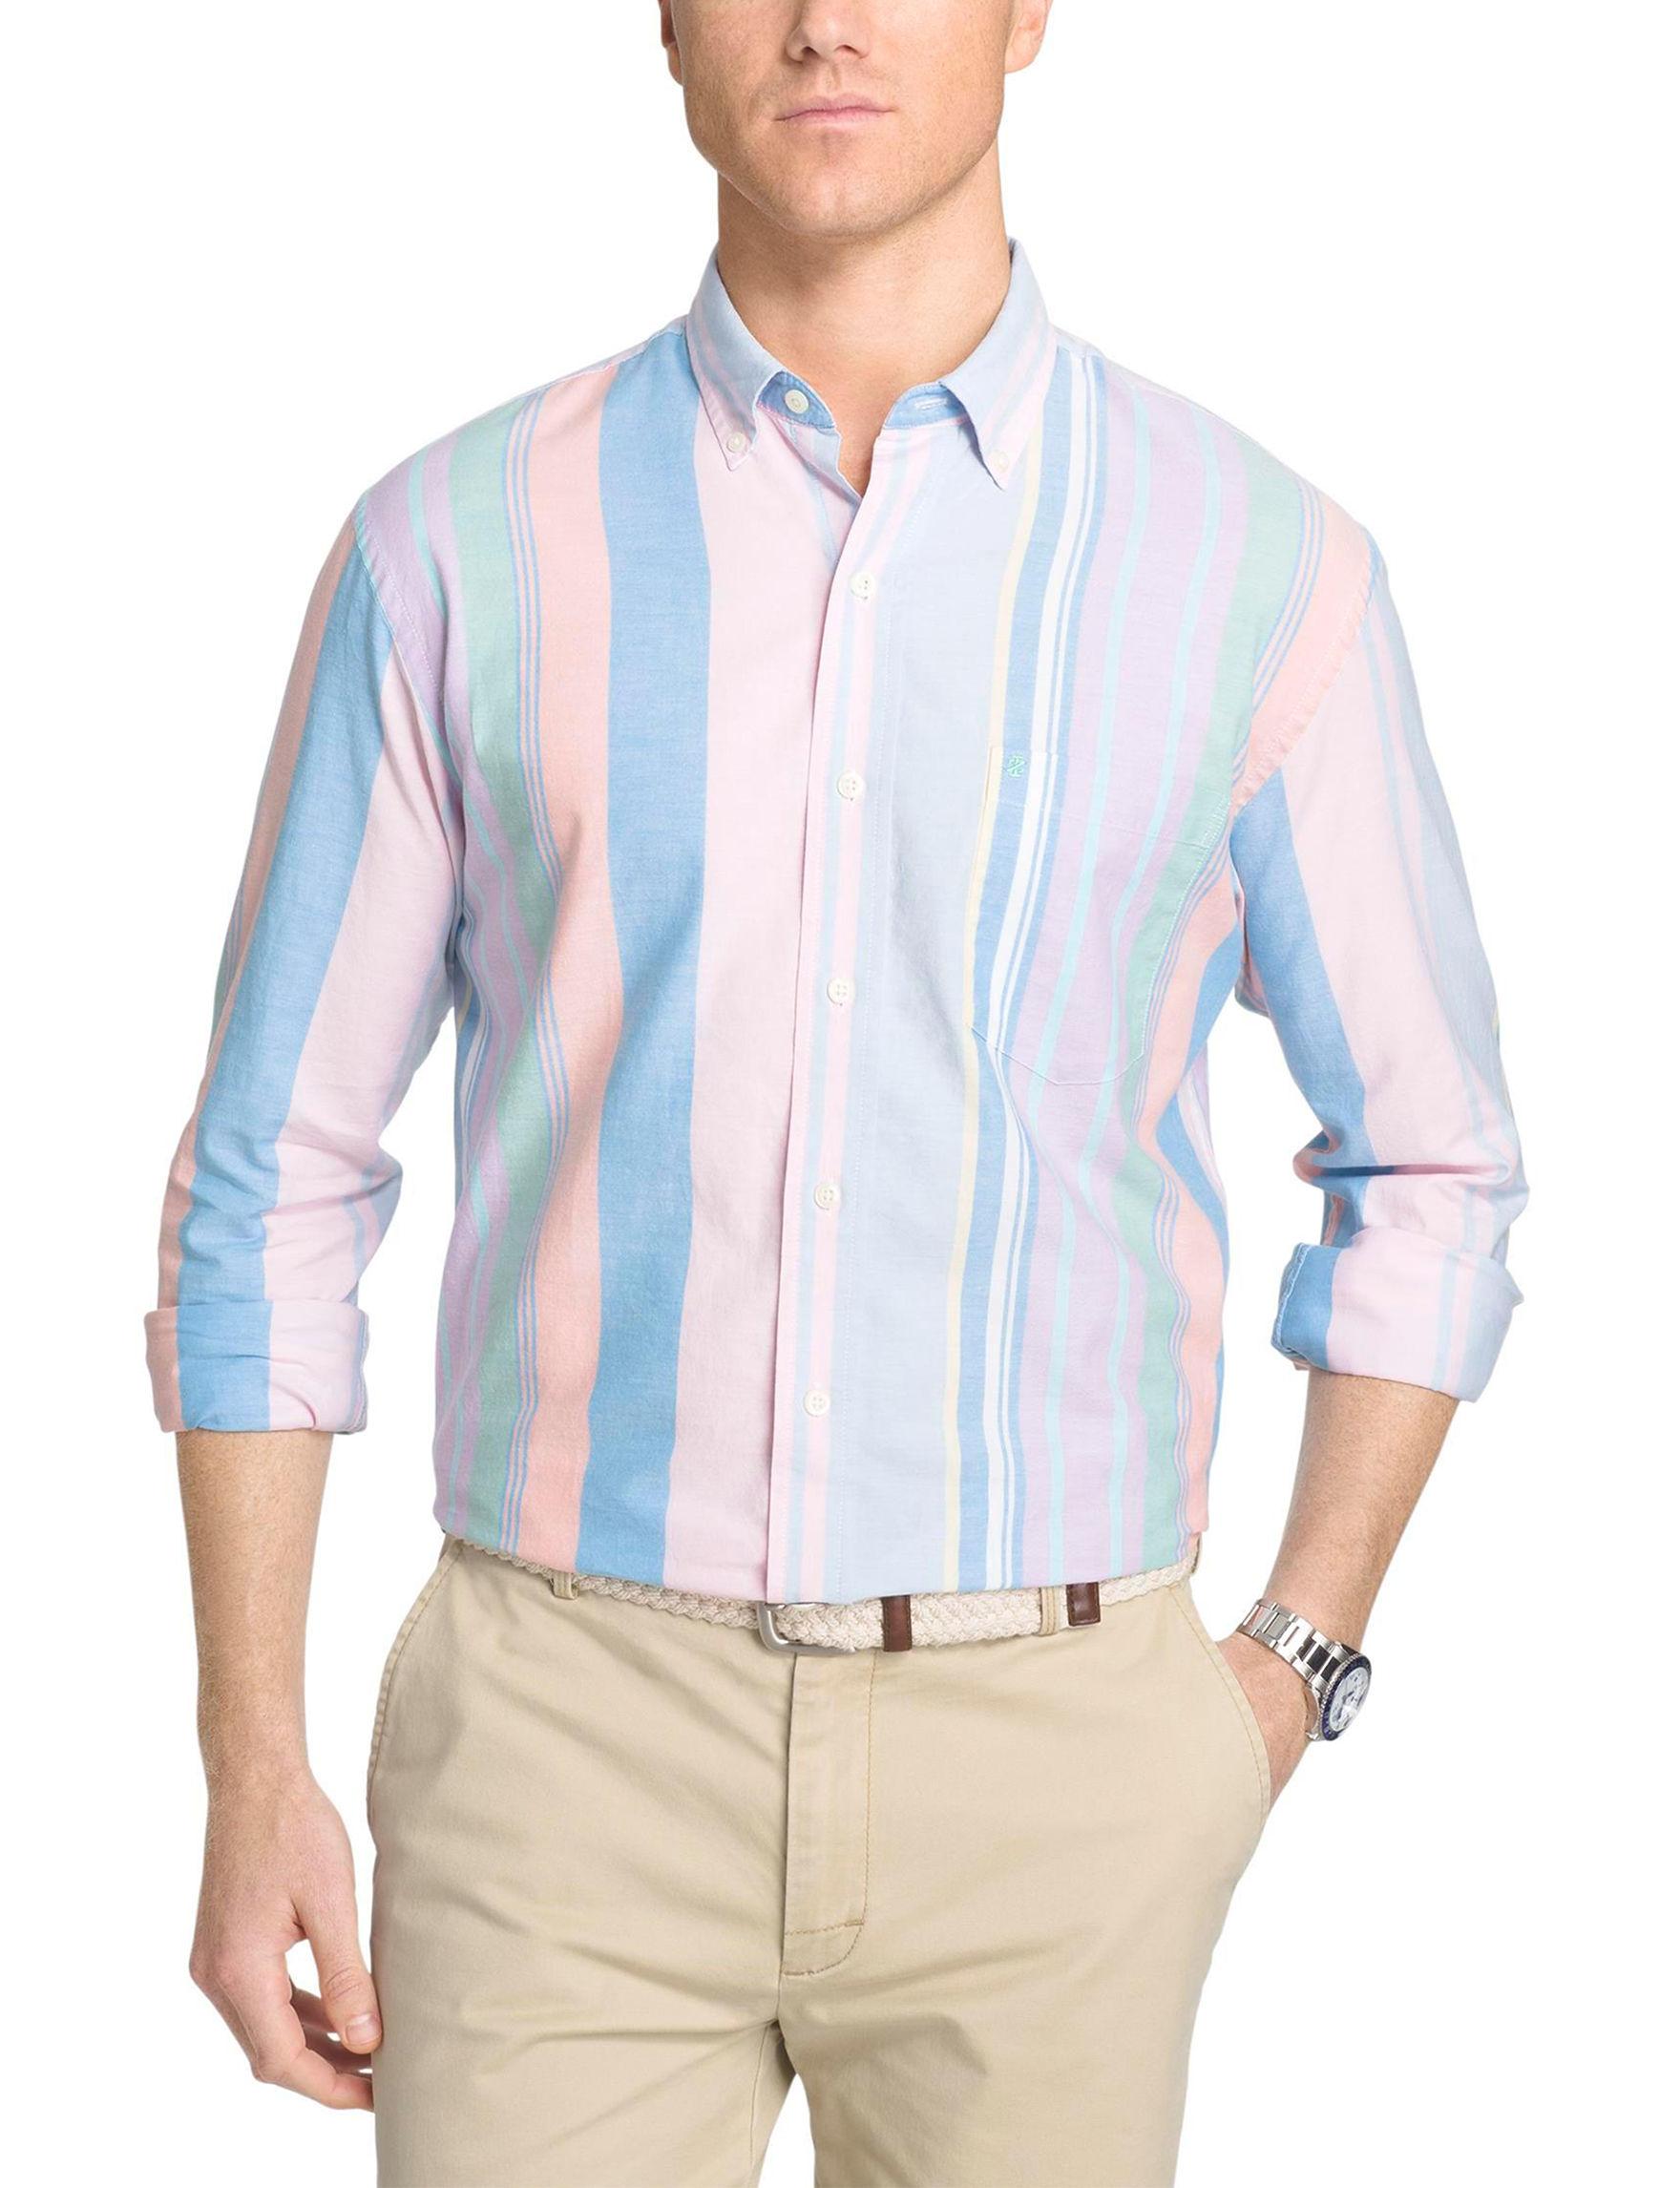 Izod Medium Pink Casual Button Down Shirts